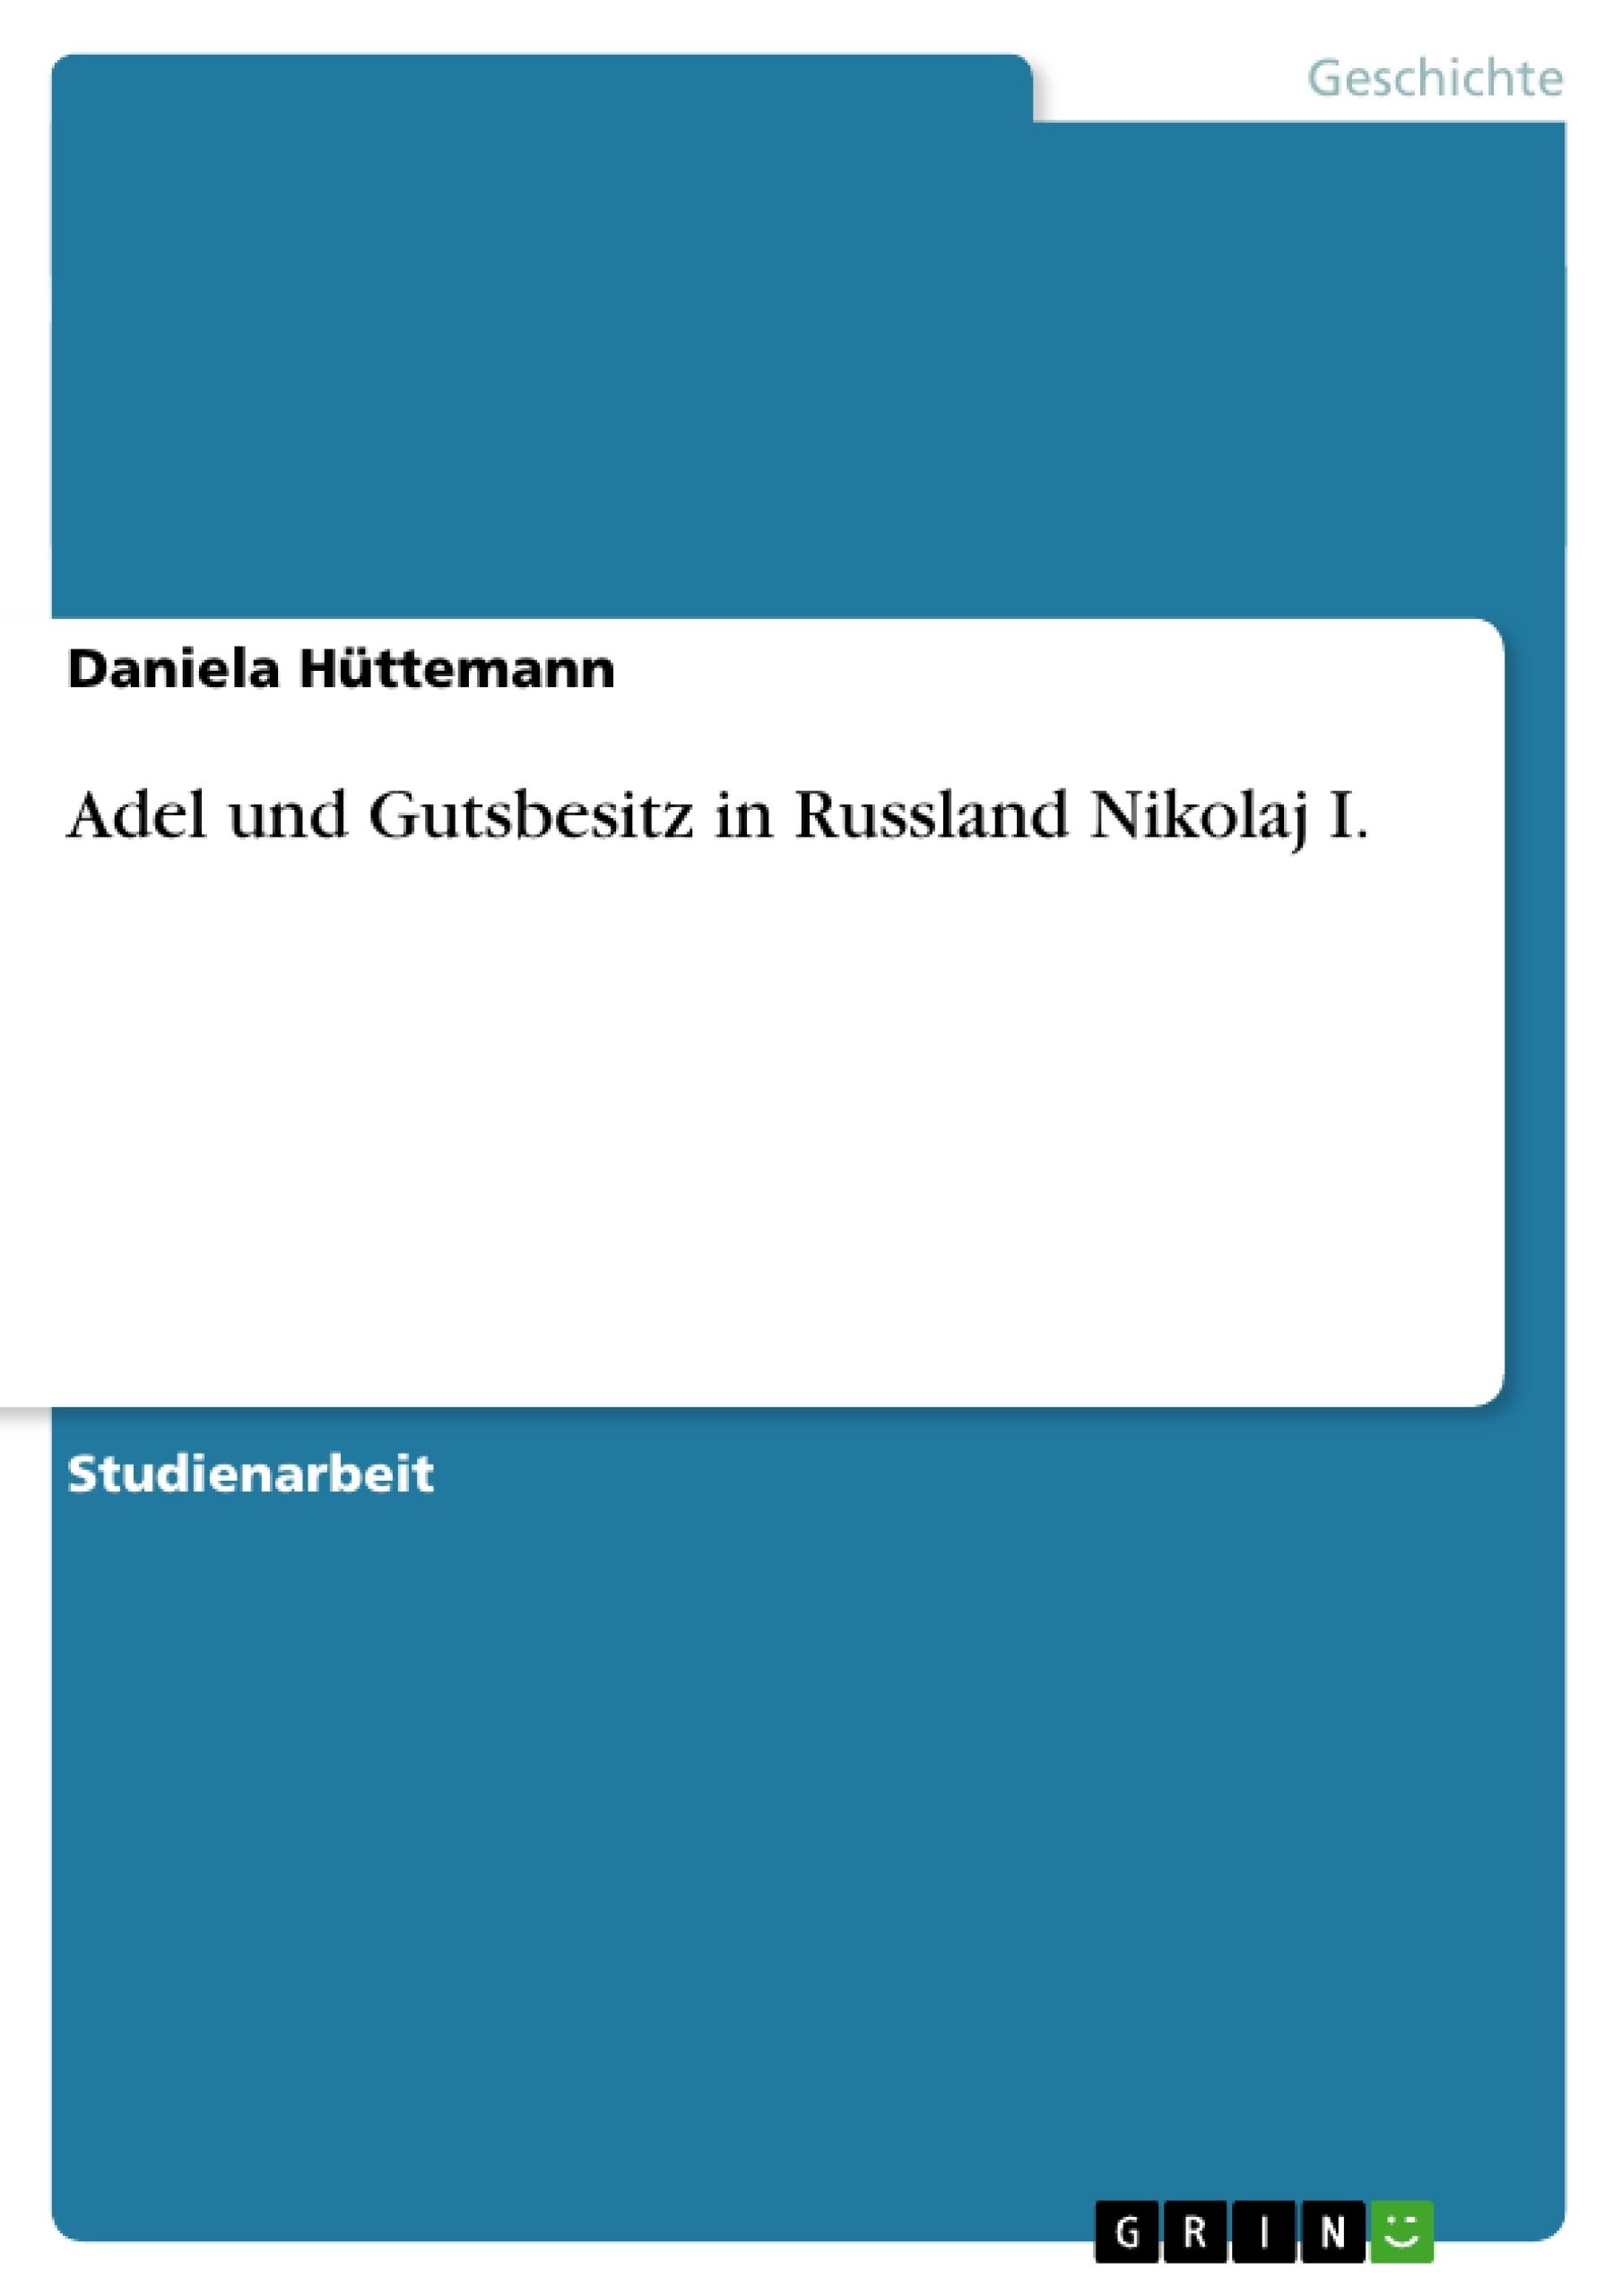 Titel: Adel und Gutsbesitz in Russland Nikolaj I.